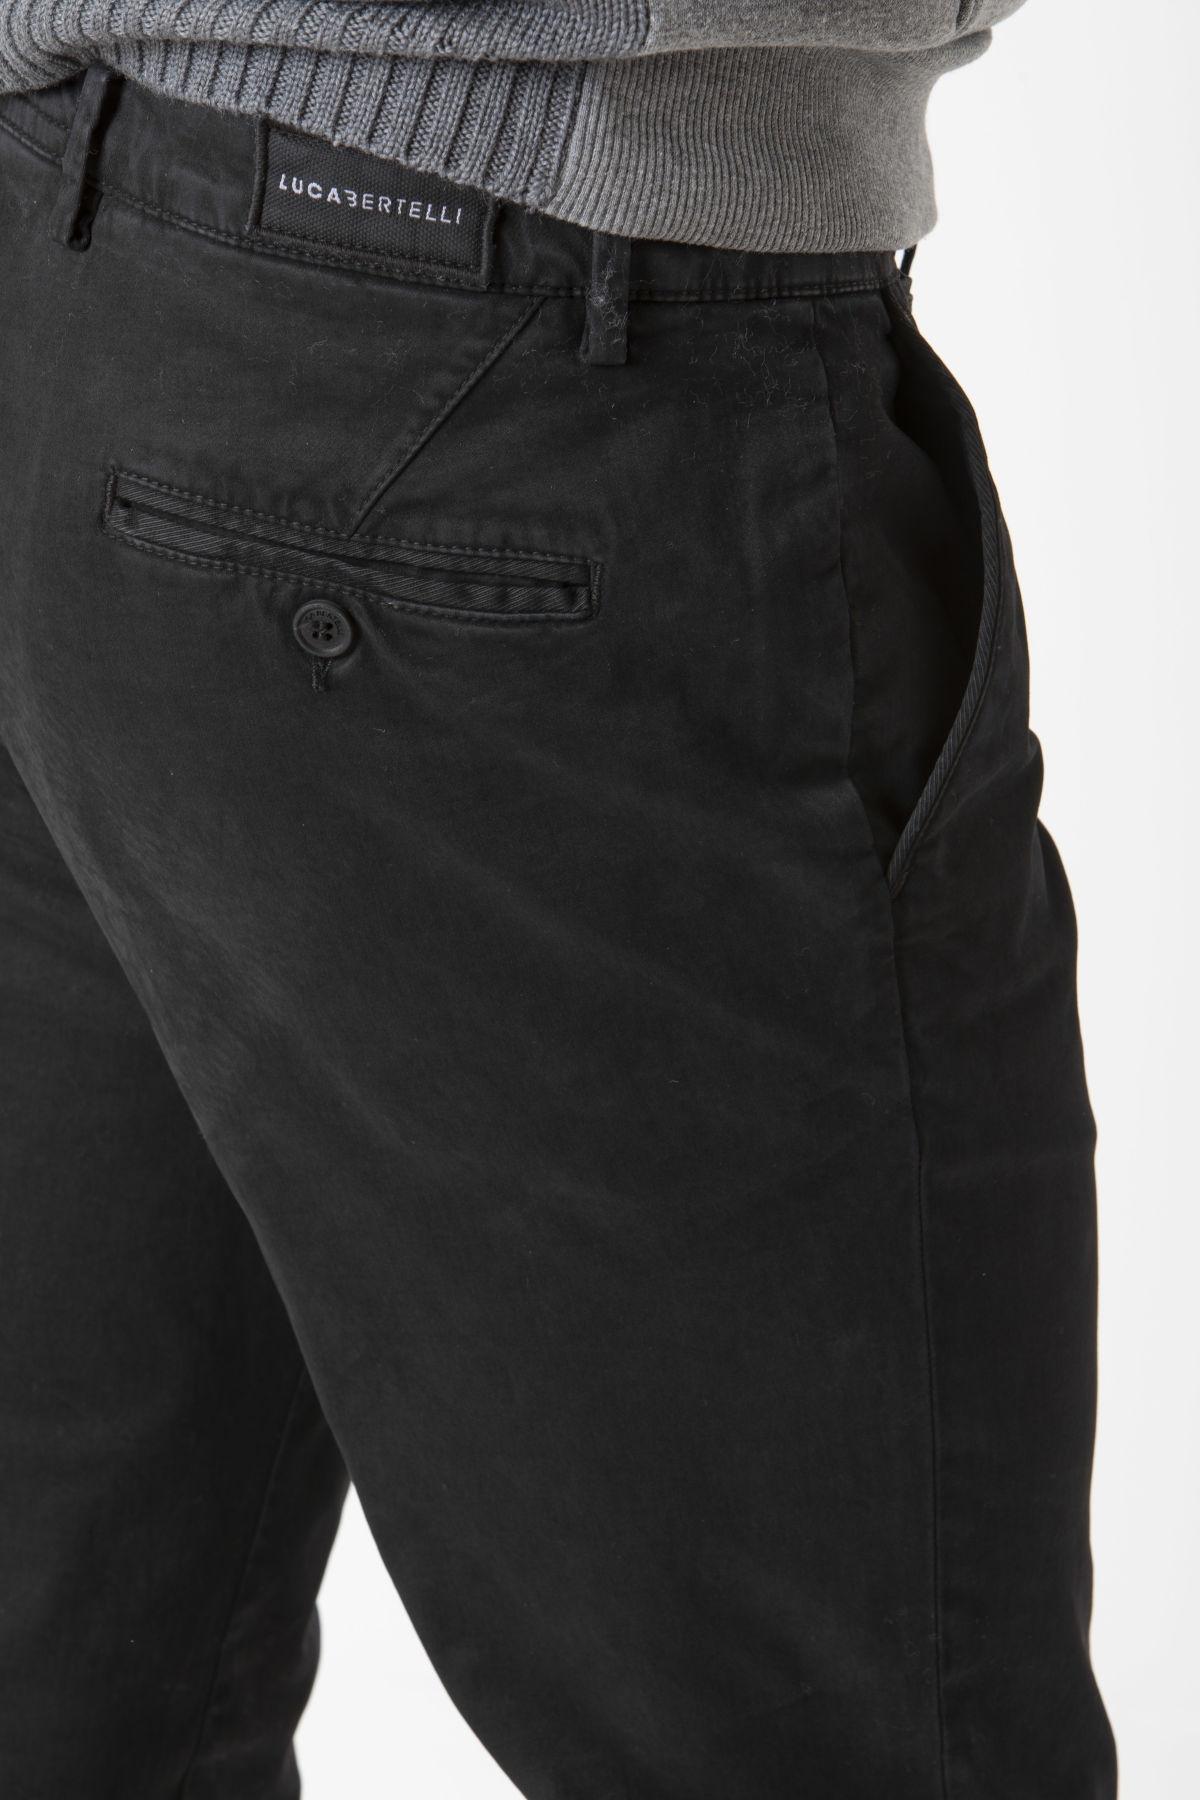 Pantaloni per uomo BERTELLI A/I 19-20